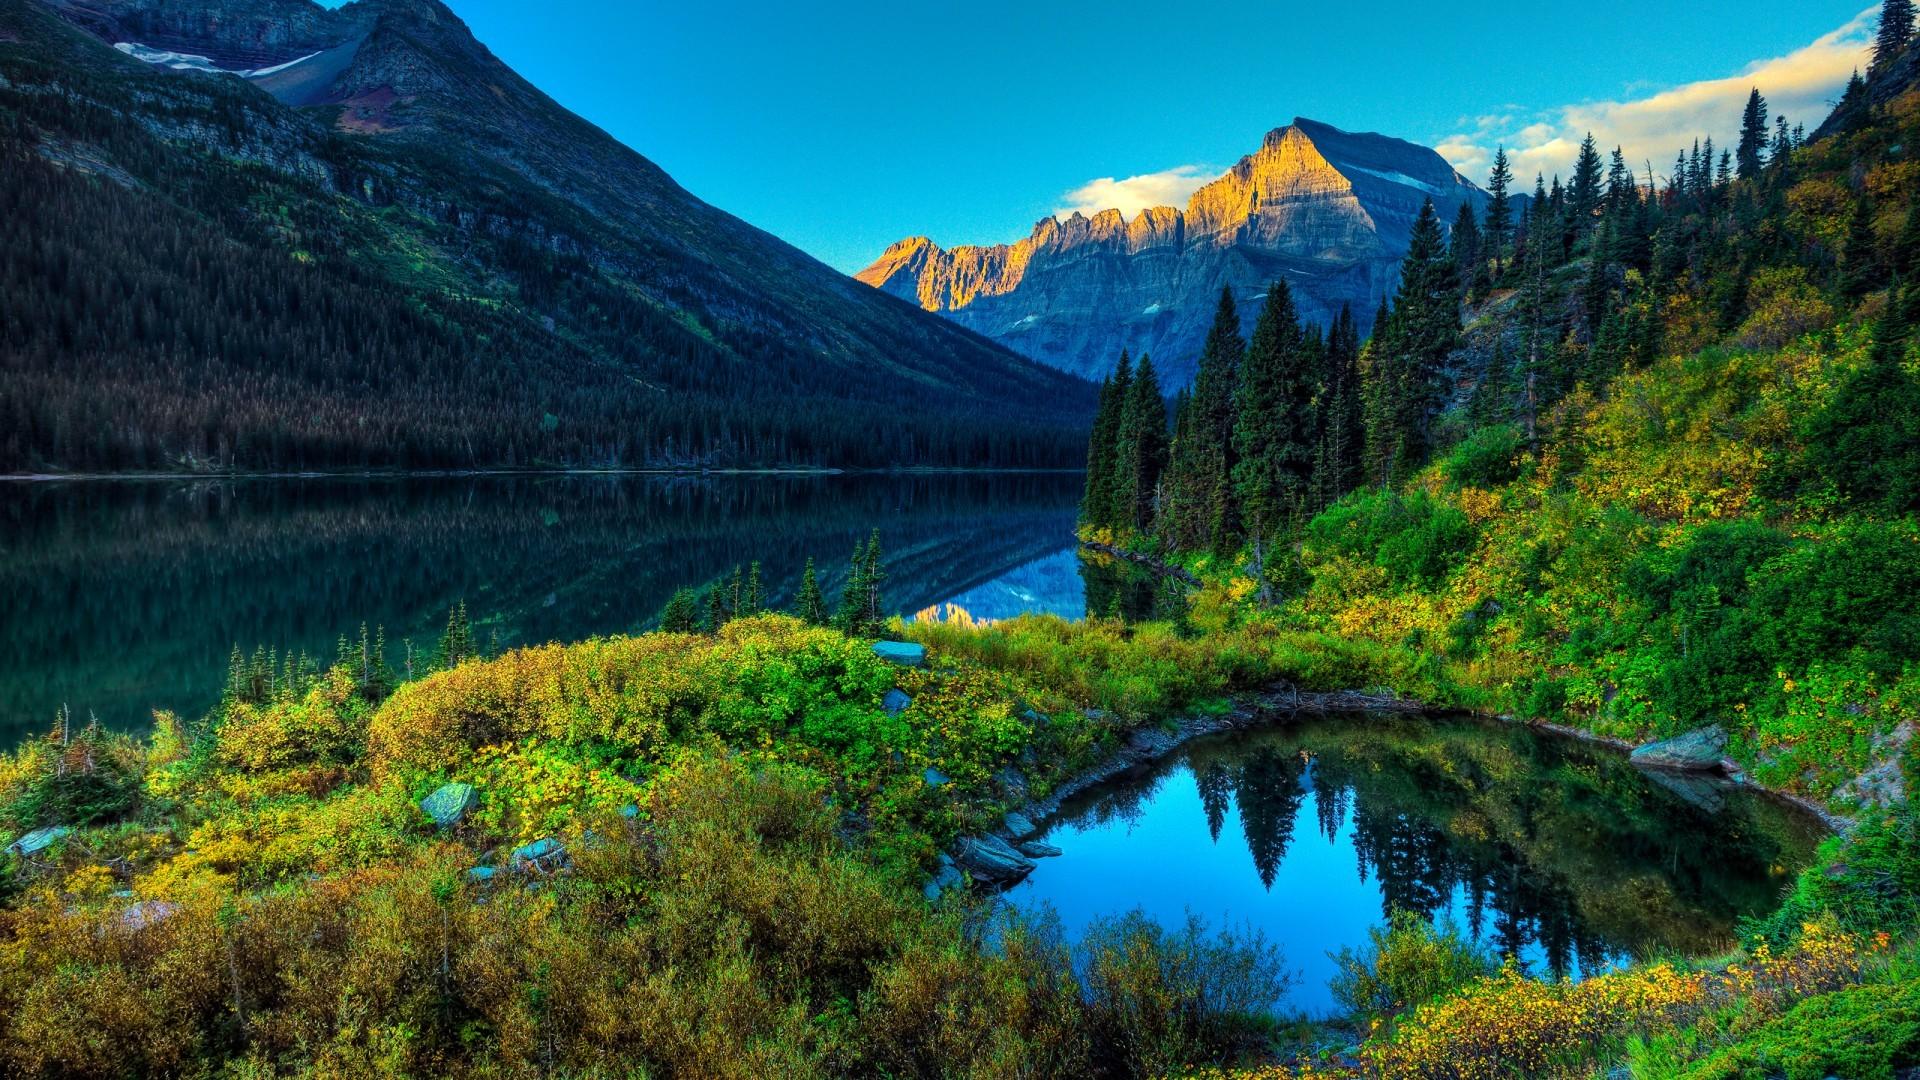 Sfondi paesaggi 62 immagini for Paesaggi bellissimi per desktop